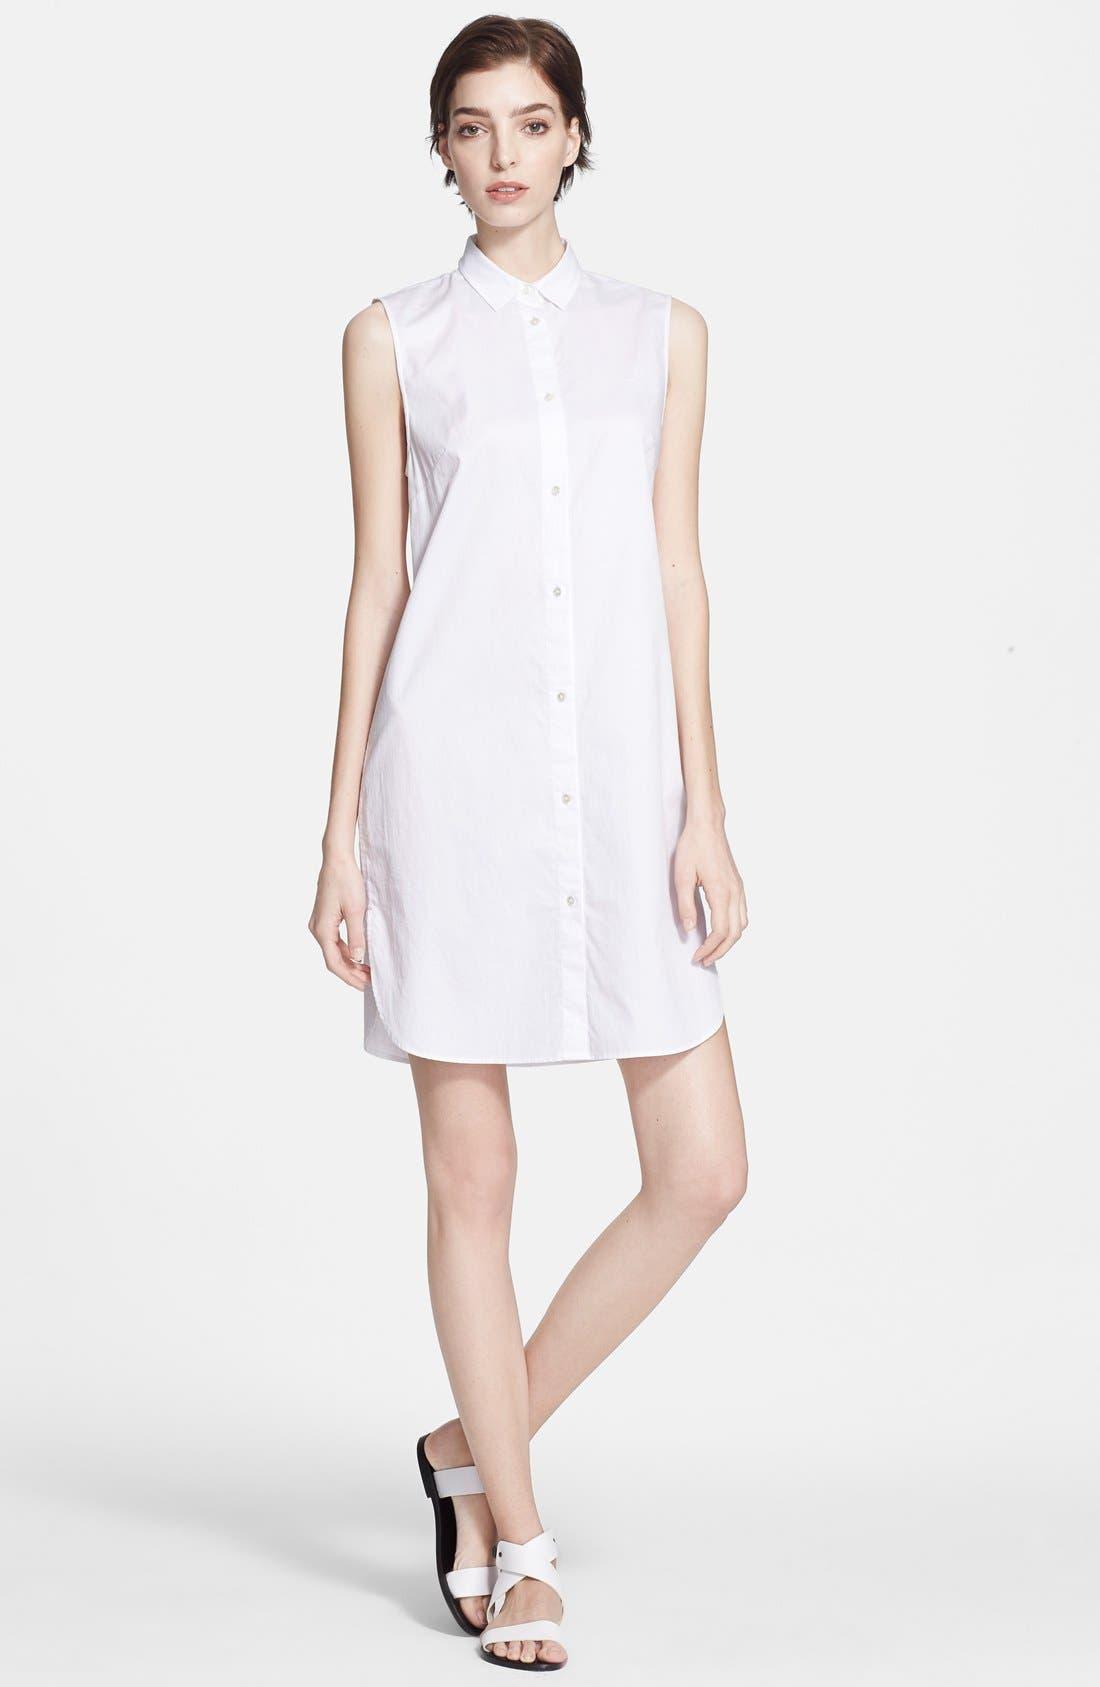 Alternate Image 1 Selected - T by Alexander Wang Cotton Poplin Shirtdress